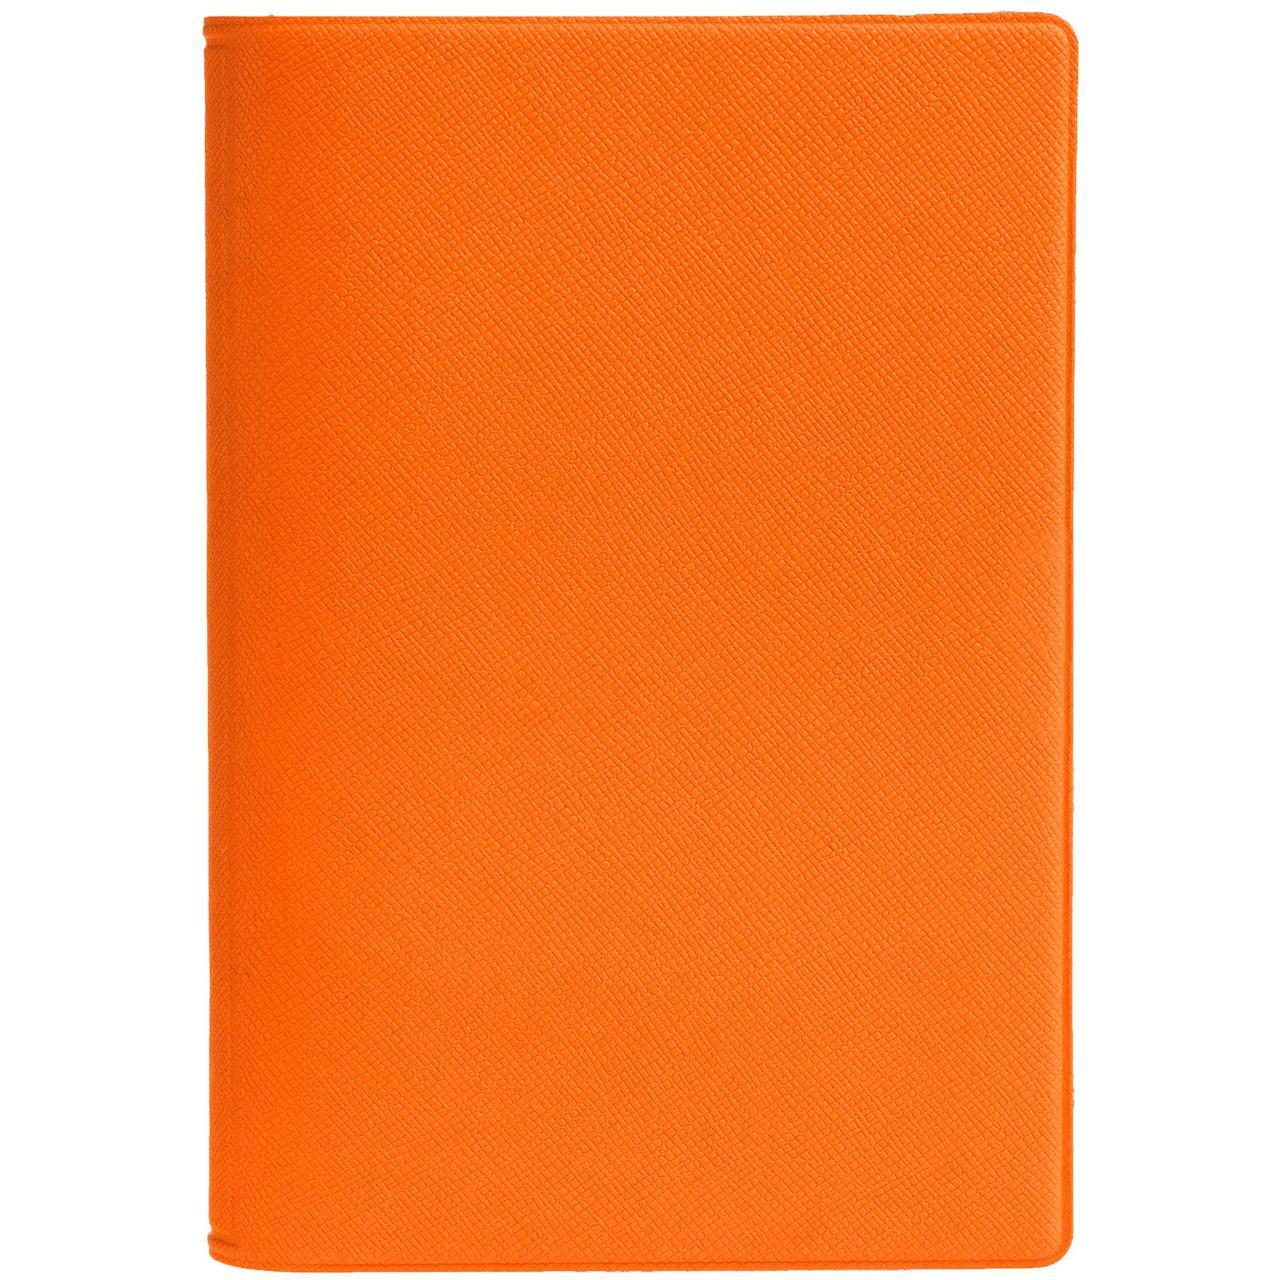 Обложка для паспорта Devon, оранжевая (артикул 10266.20)